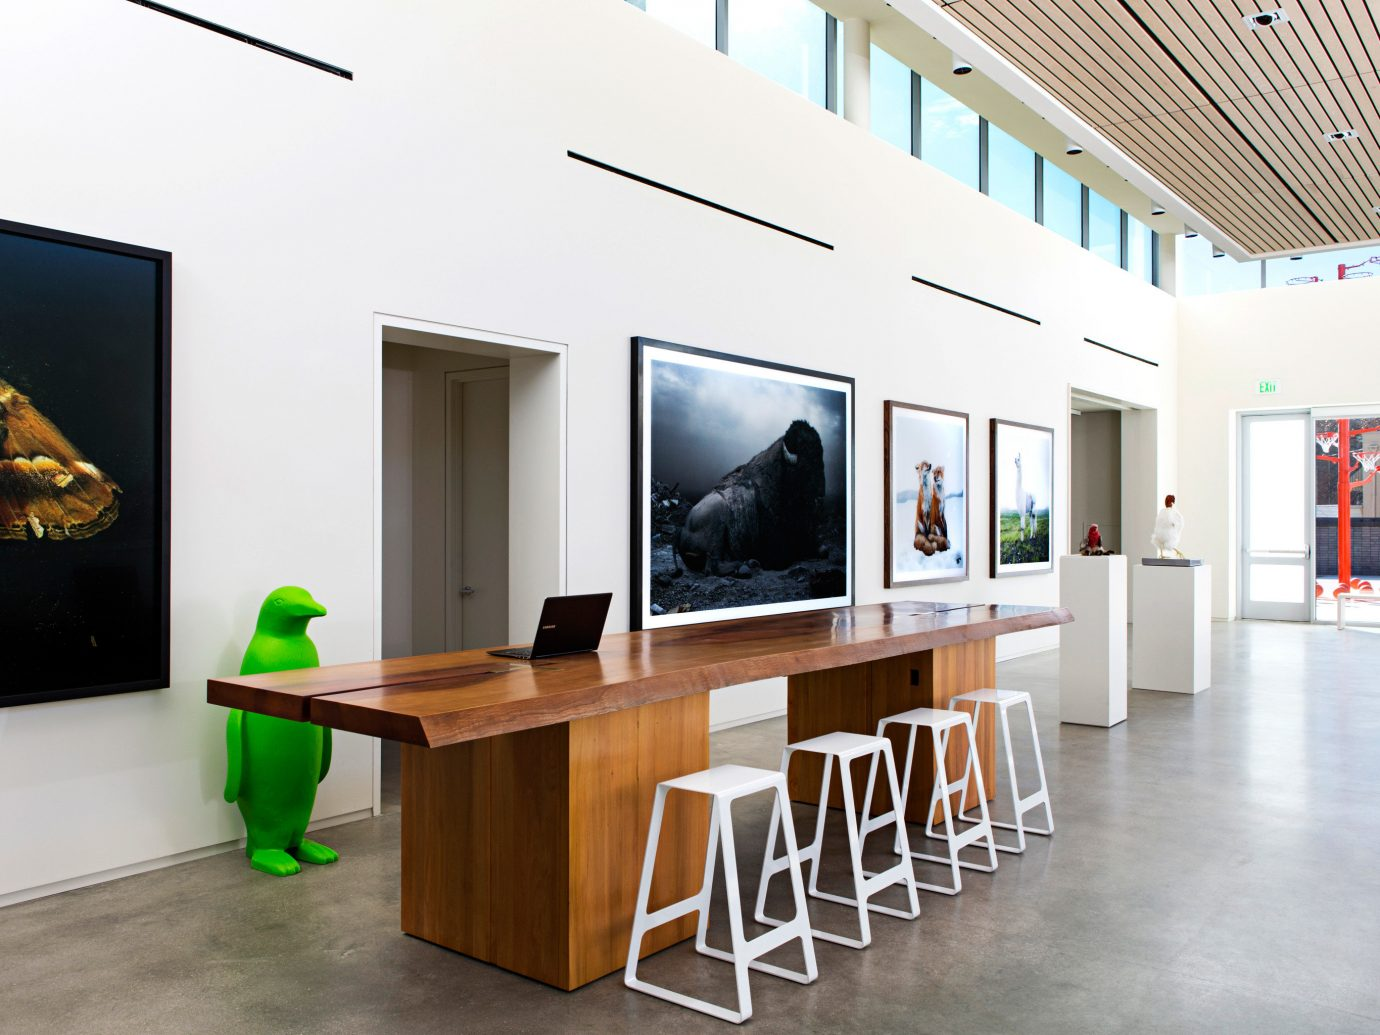 Hip Living Lounge Luxury Modern Trip Ideas floor indoor room ceiling interior design Design real estate office area furniture